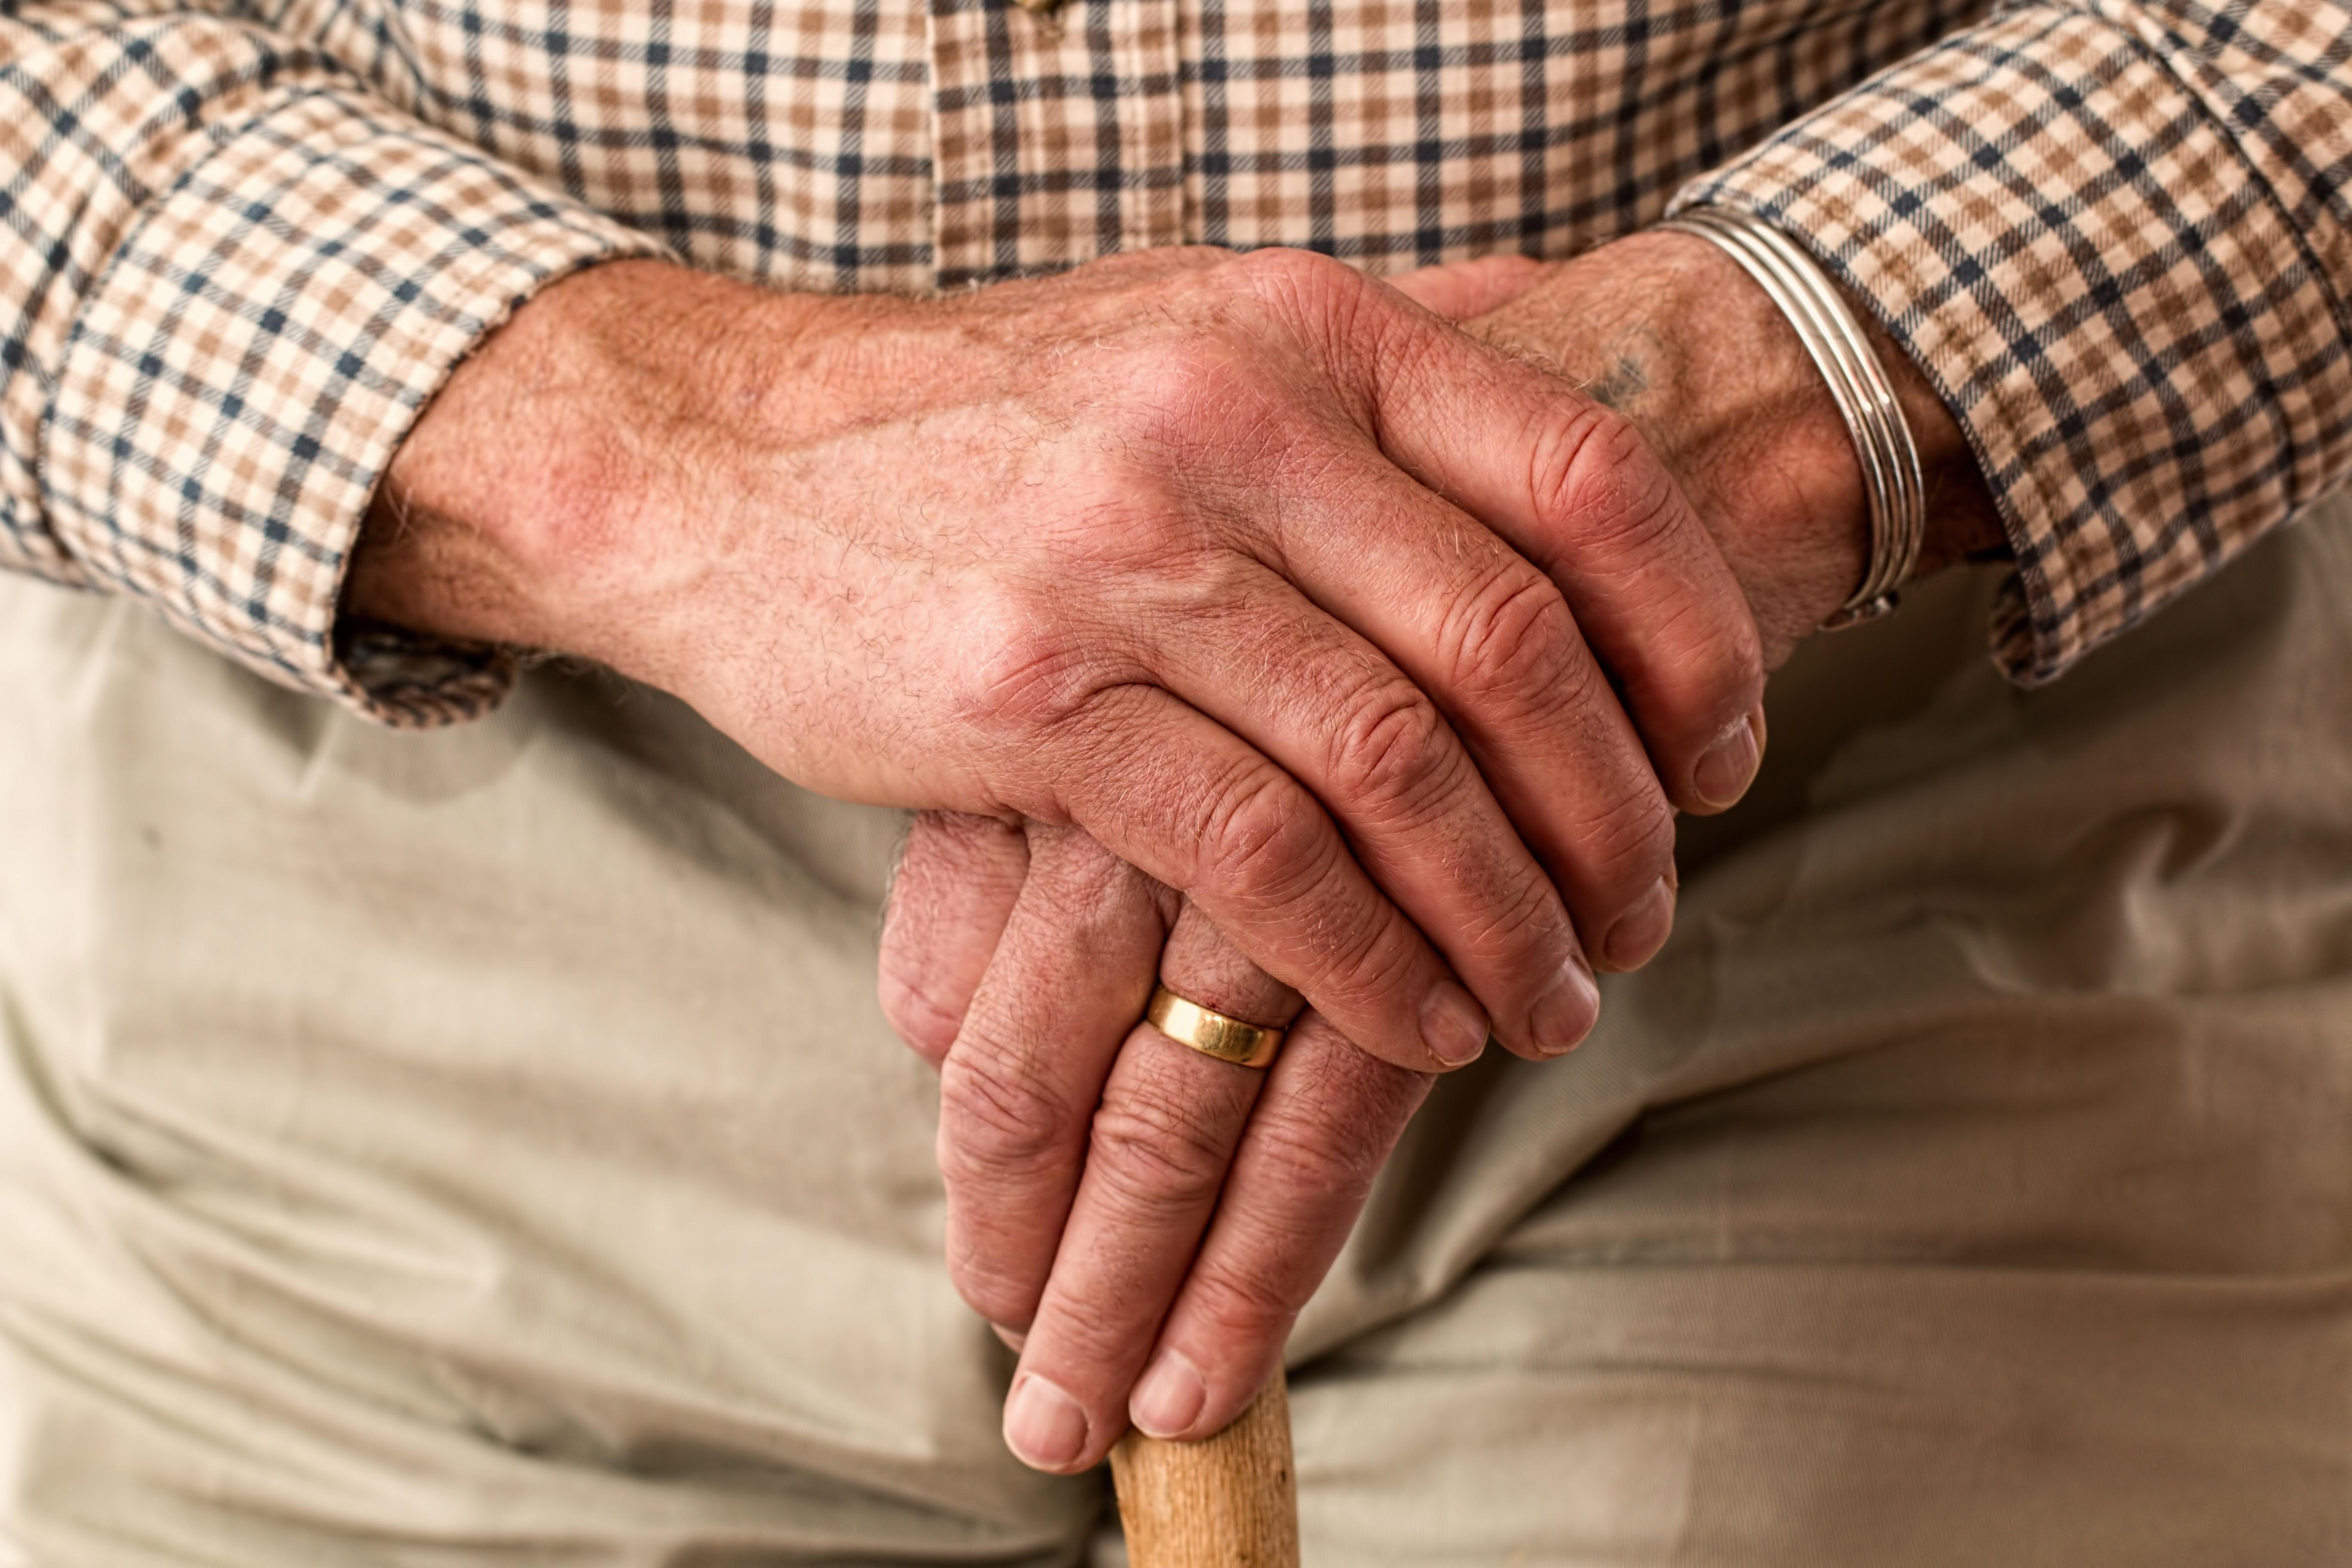 Strutture sanitarie: guida alla scelta migliore per i nostri cari